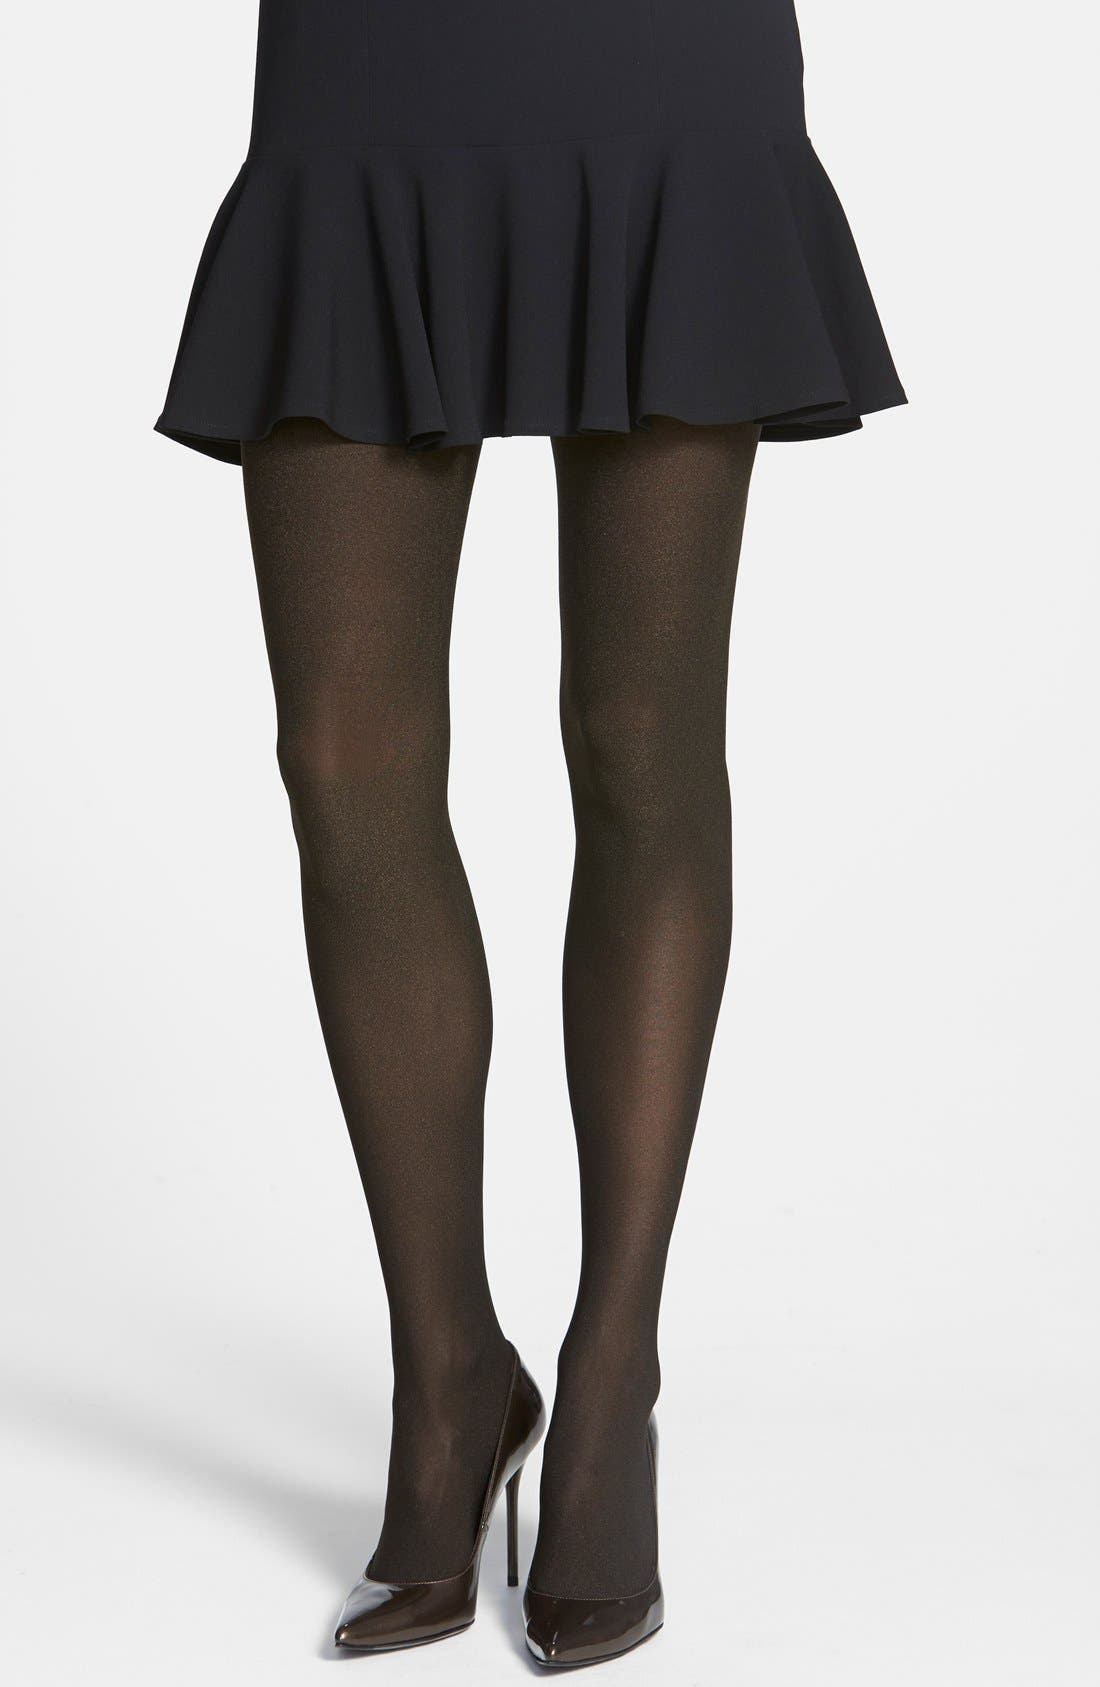 Alternate Image 1 Selected - Donna Karan 'Blackened Shimmer' Tights